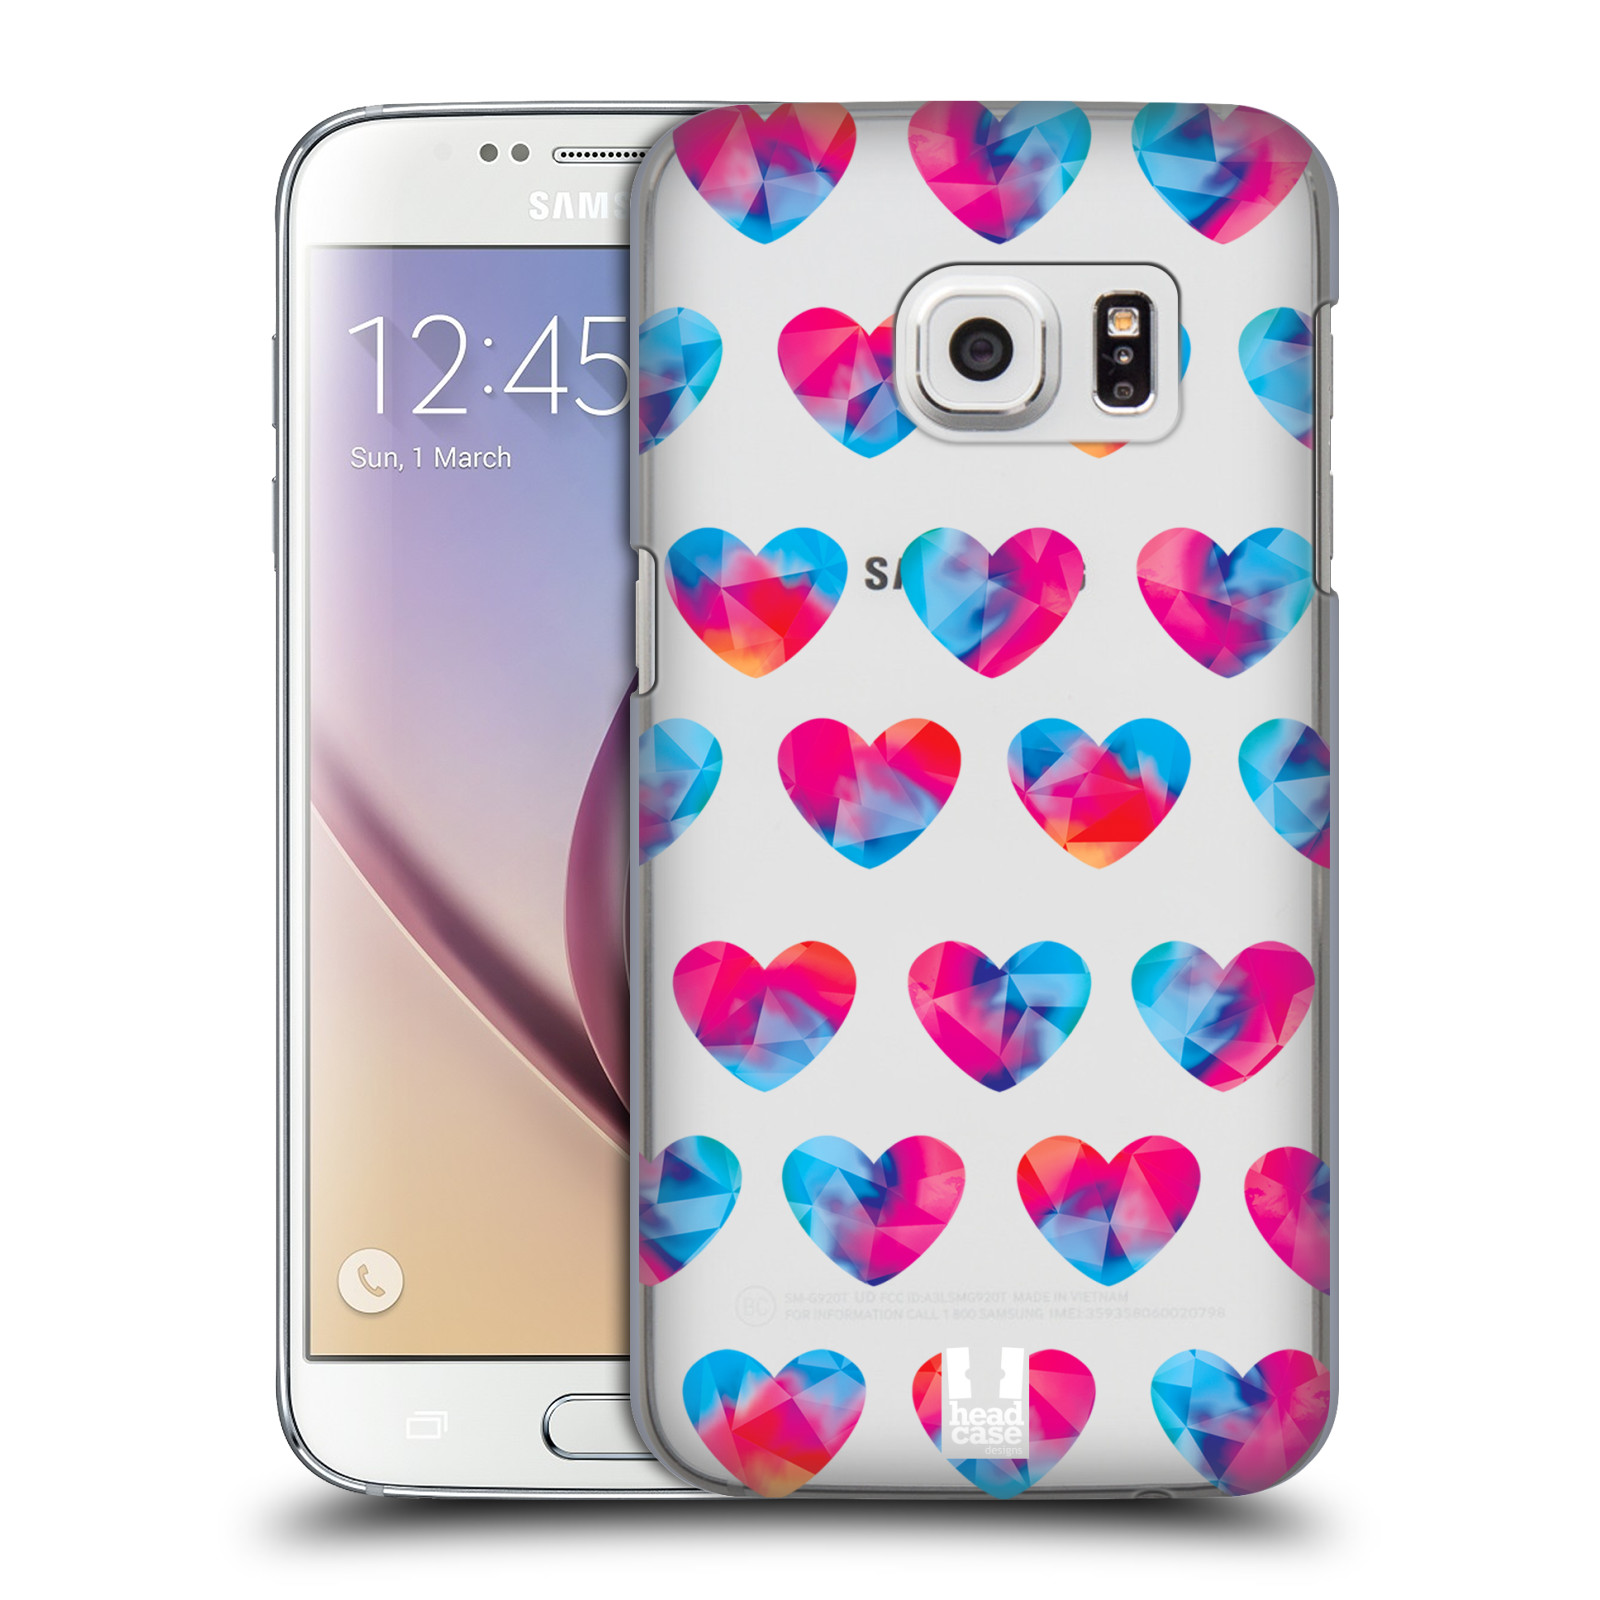 Plastové pouzdro na mobil Samsung Galaxy S7 - Head Case - Srdíčka hrající barvami